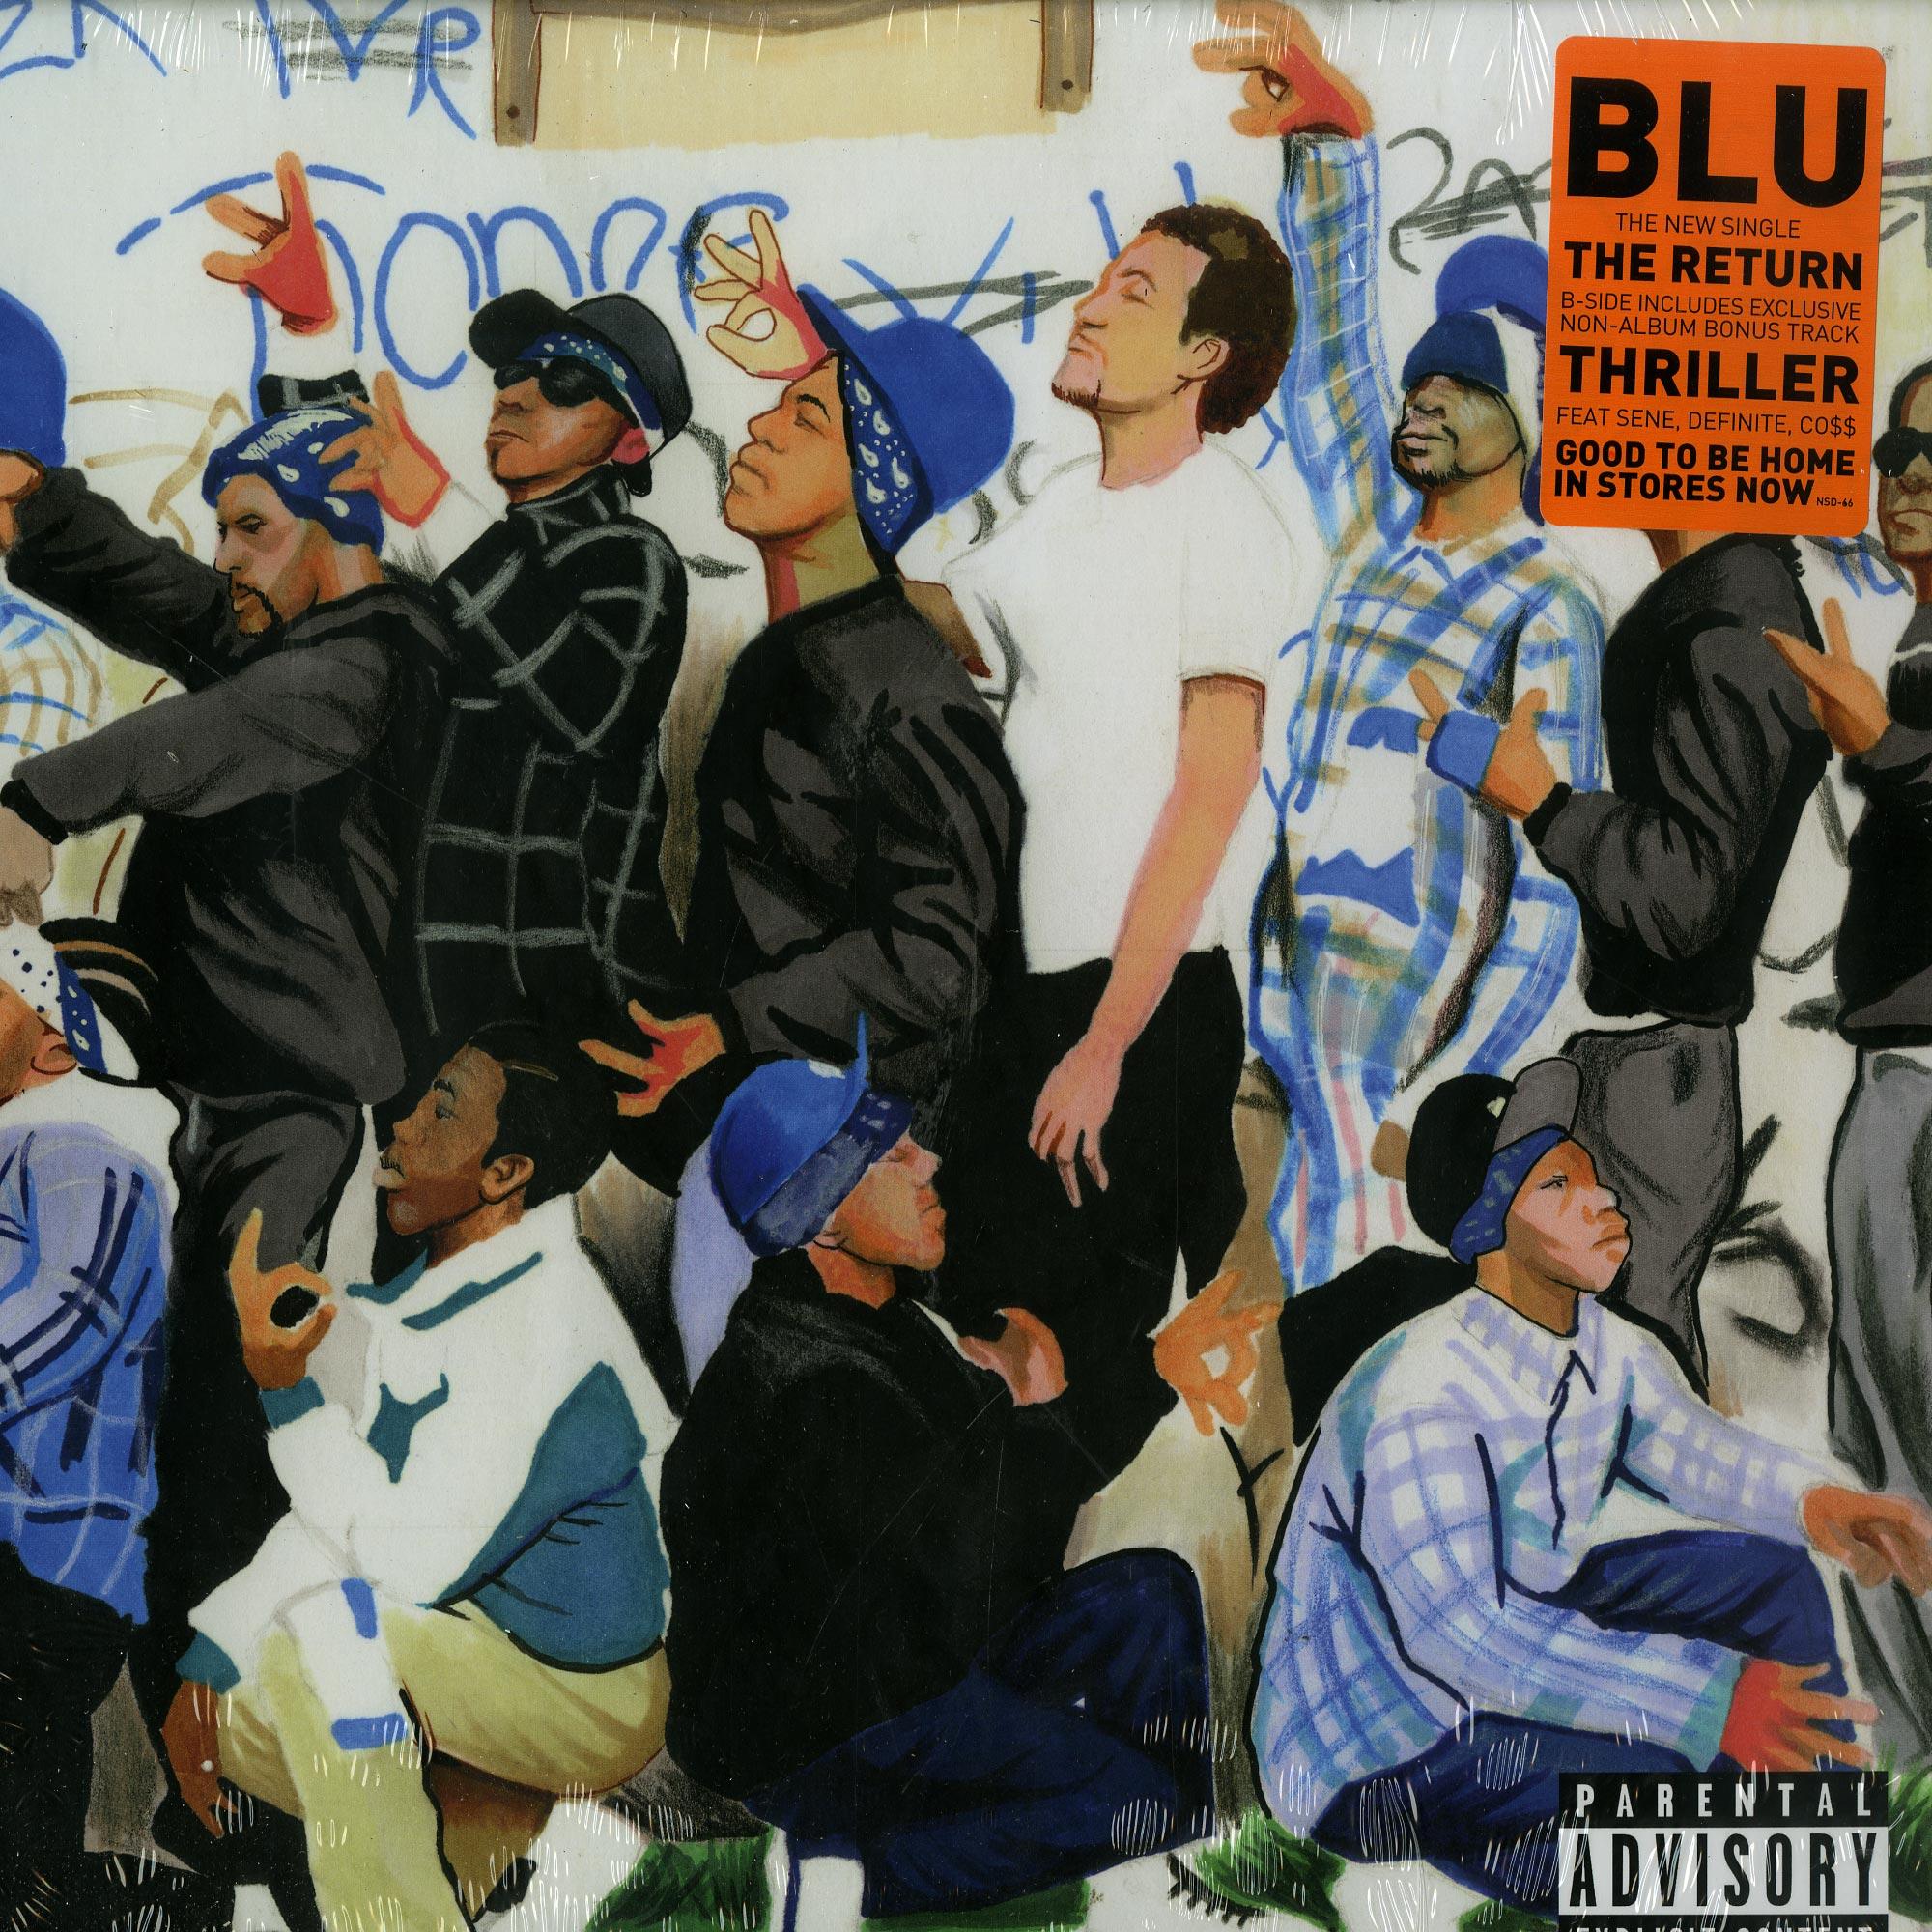 Blu - THE RETURN